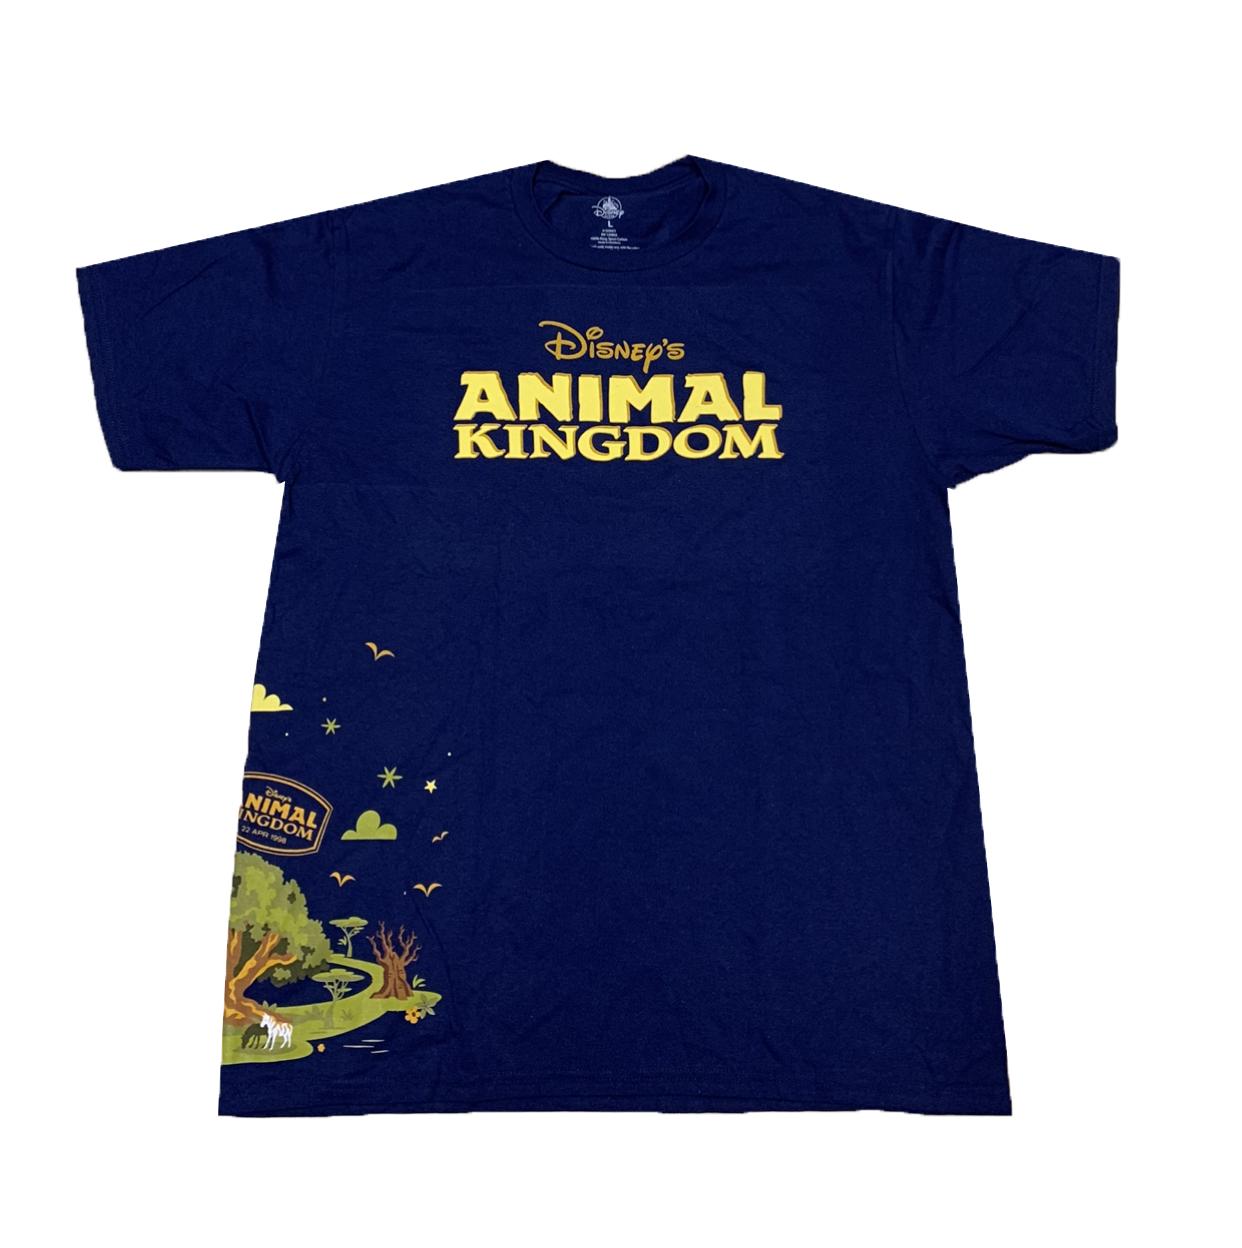 Animal Kingdom Christmas Shirt.Disney Shirt For Adults Animal Kingdom Passport Blue